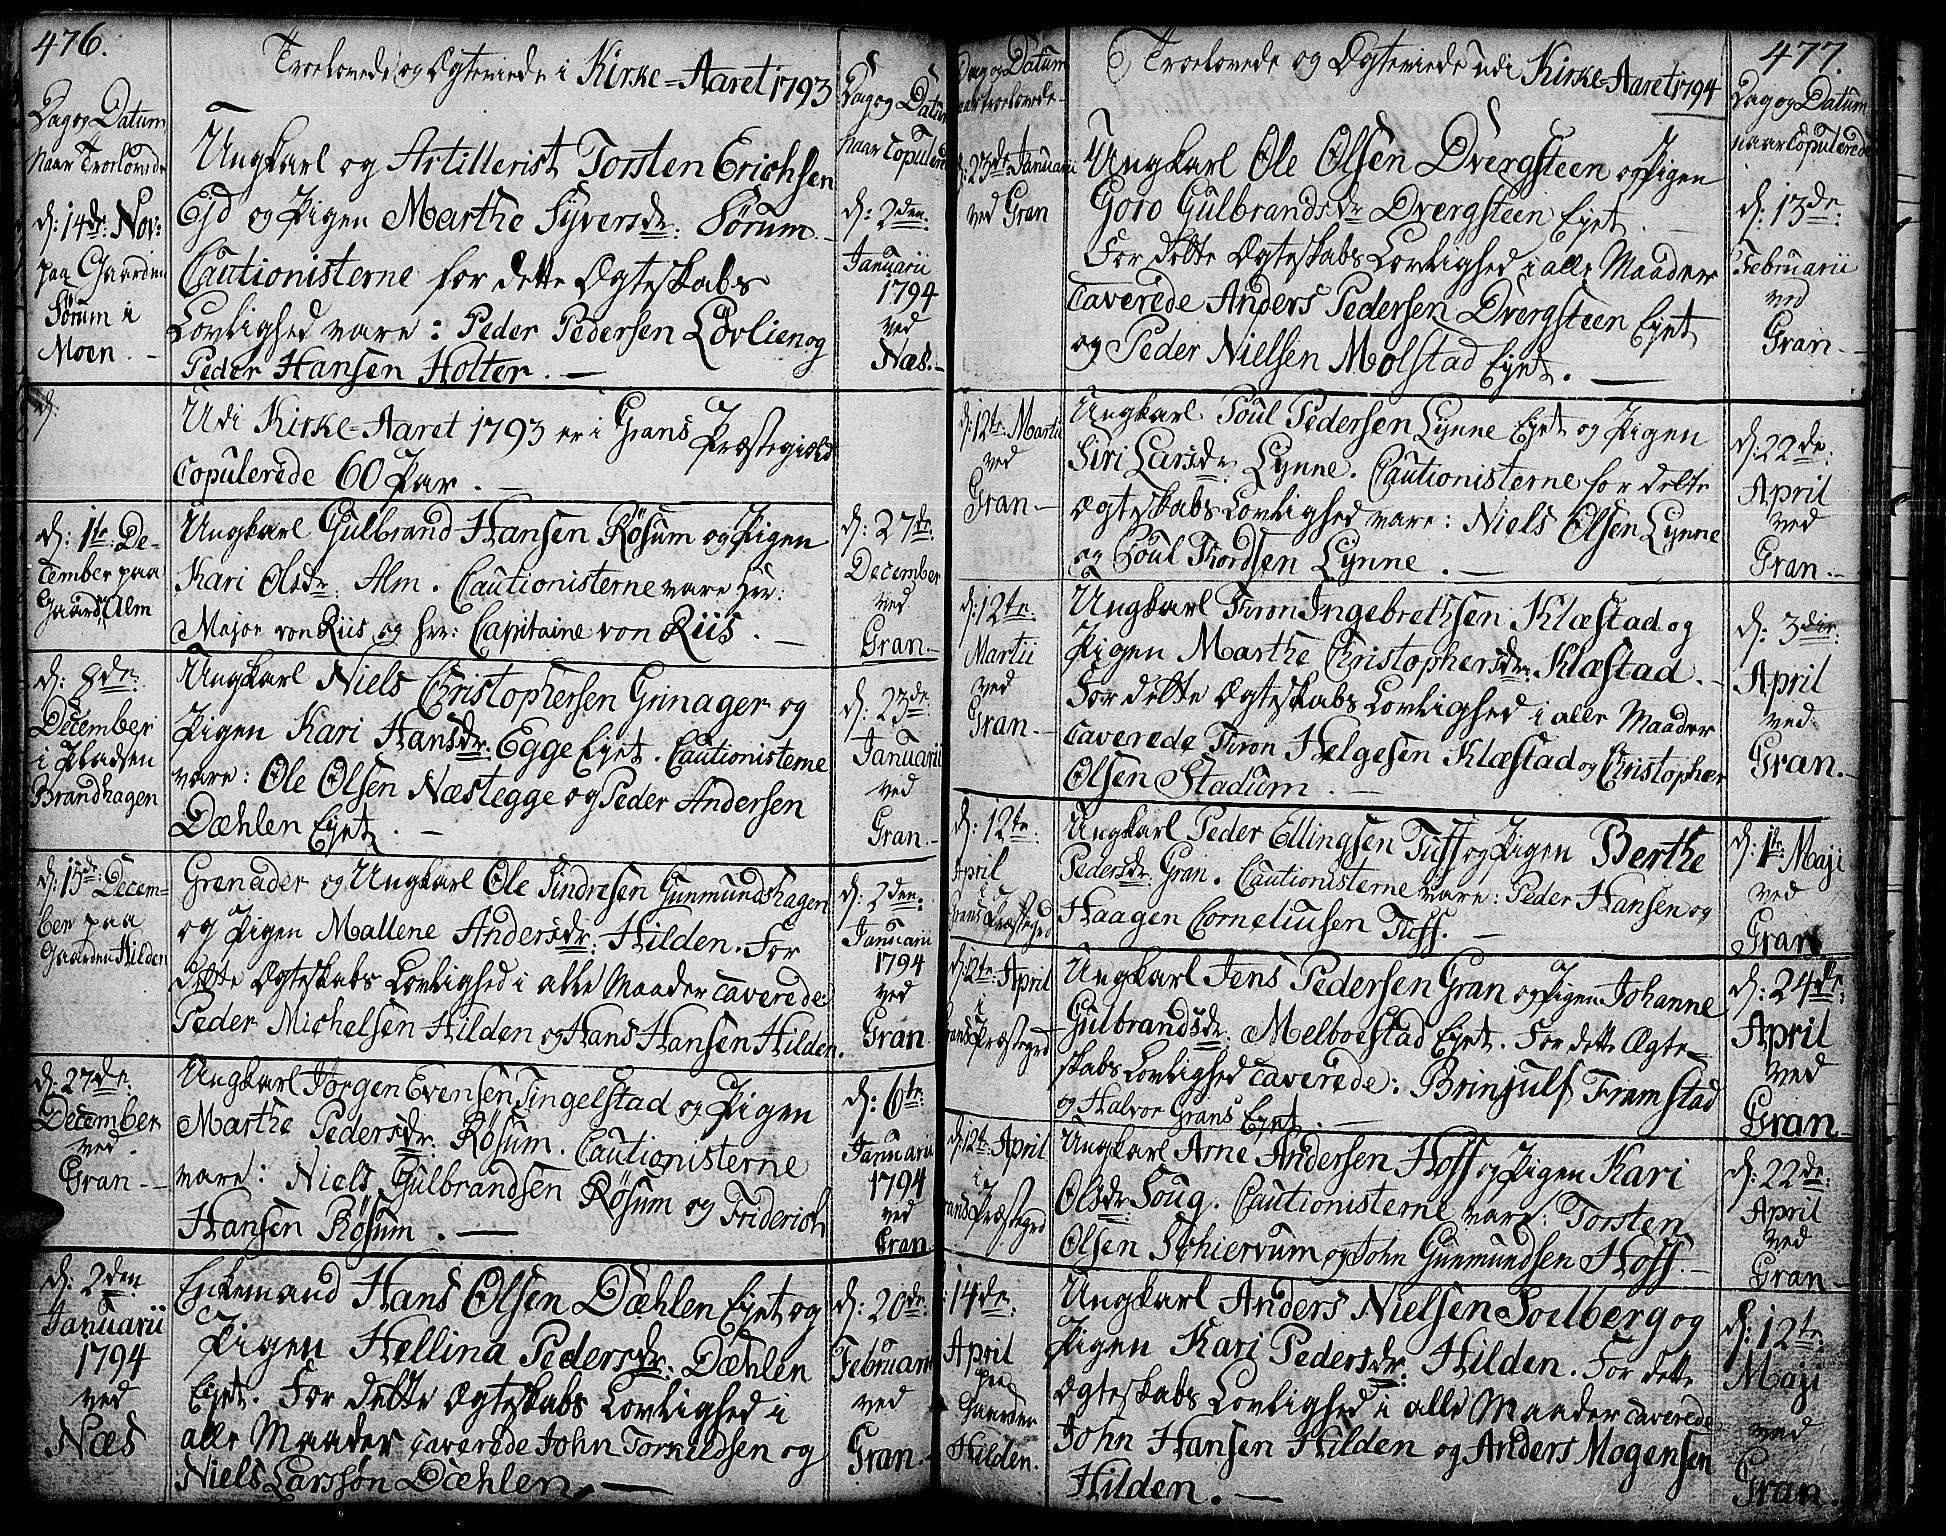 SAH, Gran prestekontor, Ministerialbok nr. 6, 1787-1824, s. 476-477